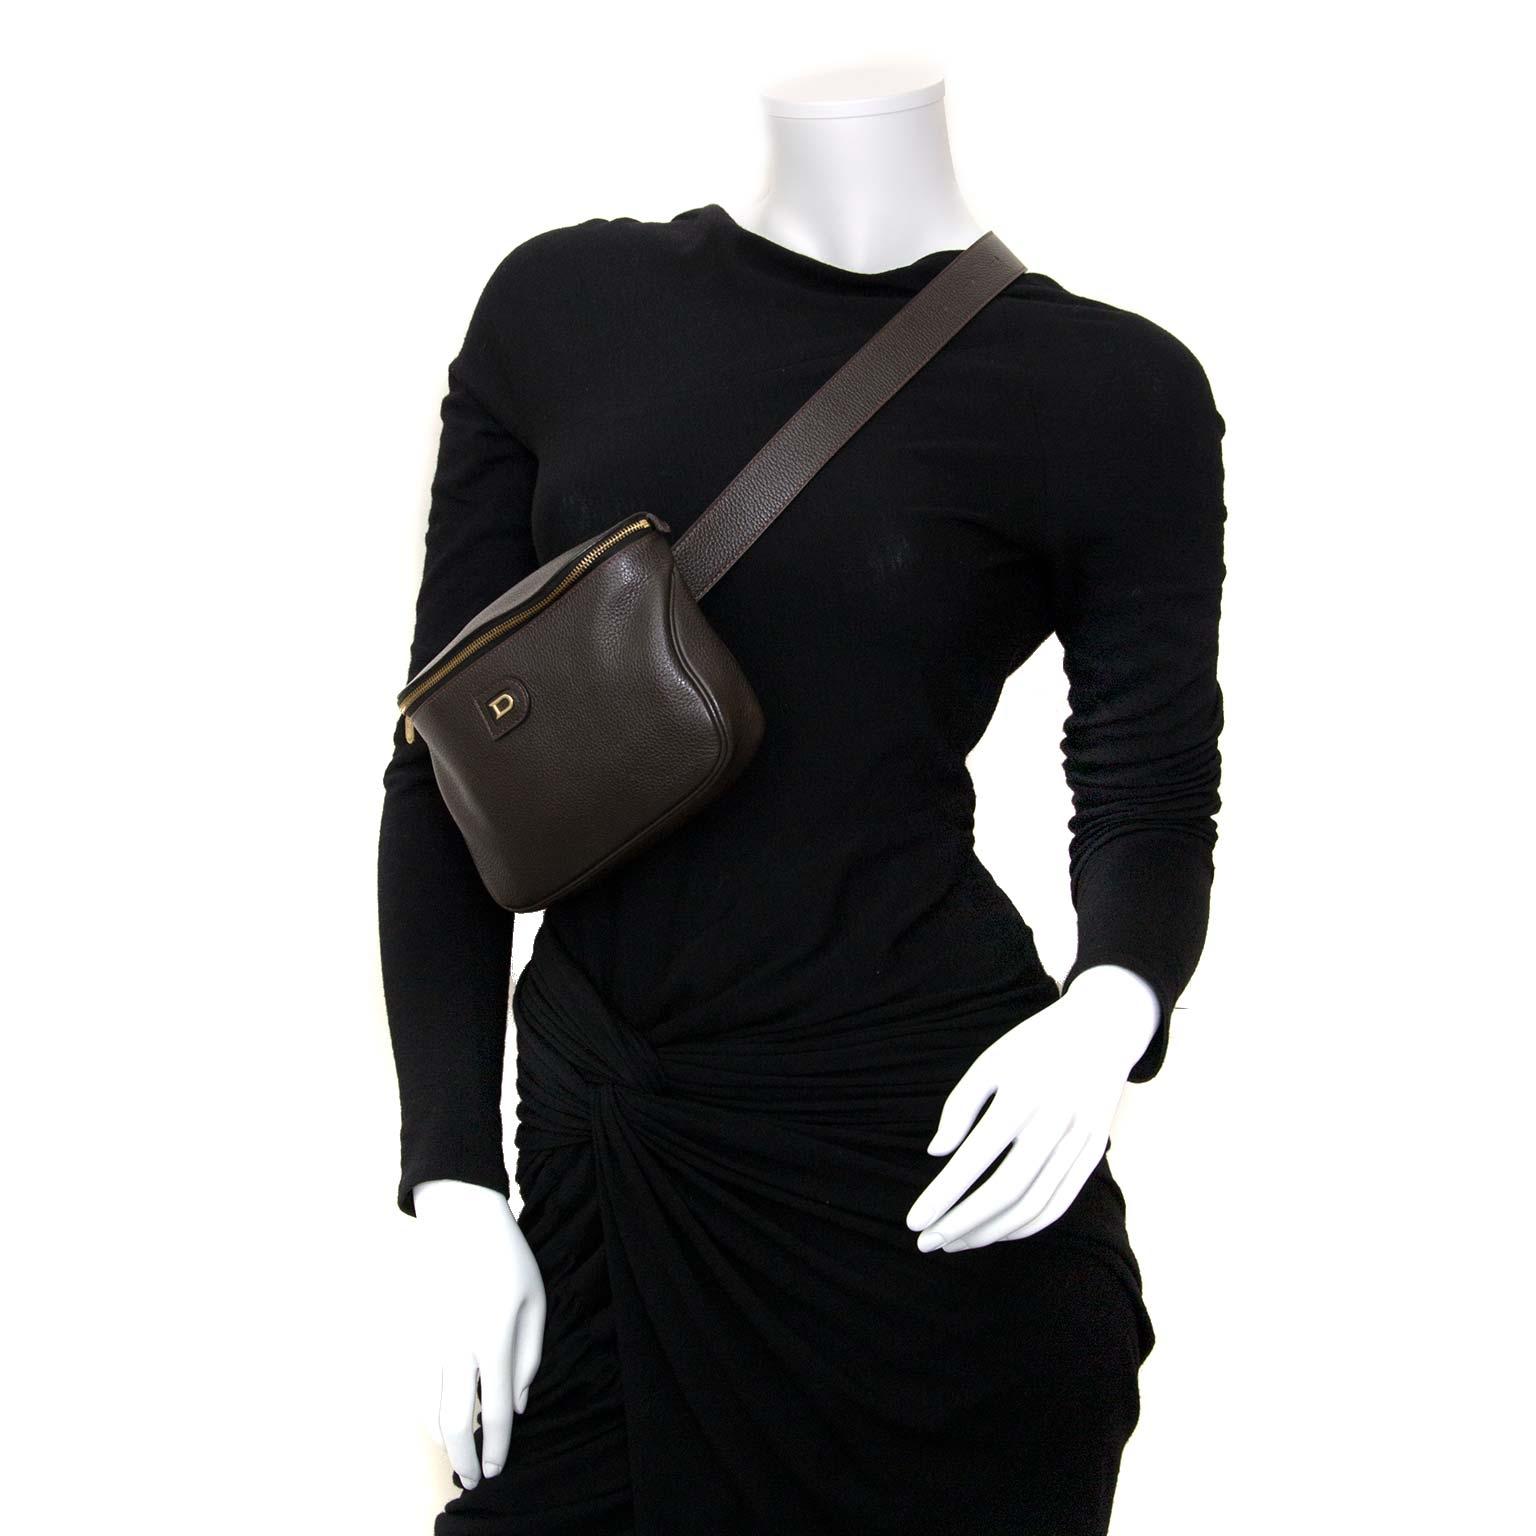 delvaux brown leather belt bag now for sale at labellov vintage fashion webshop belgium